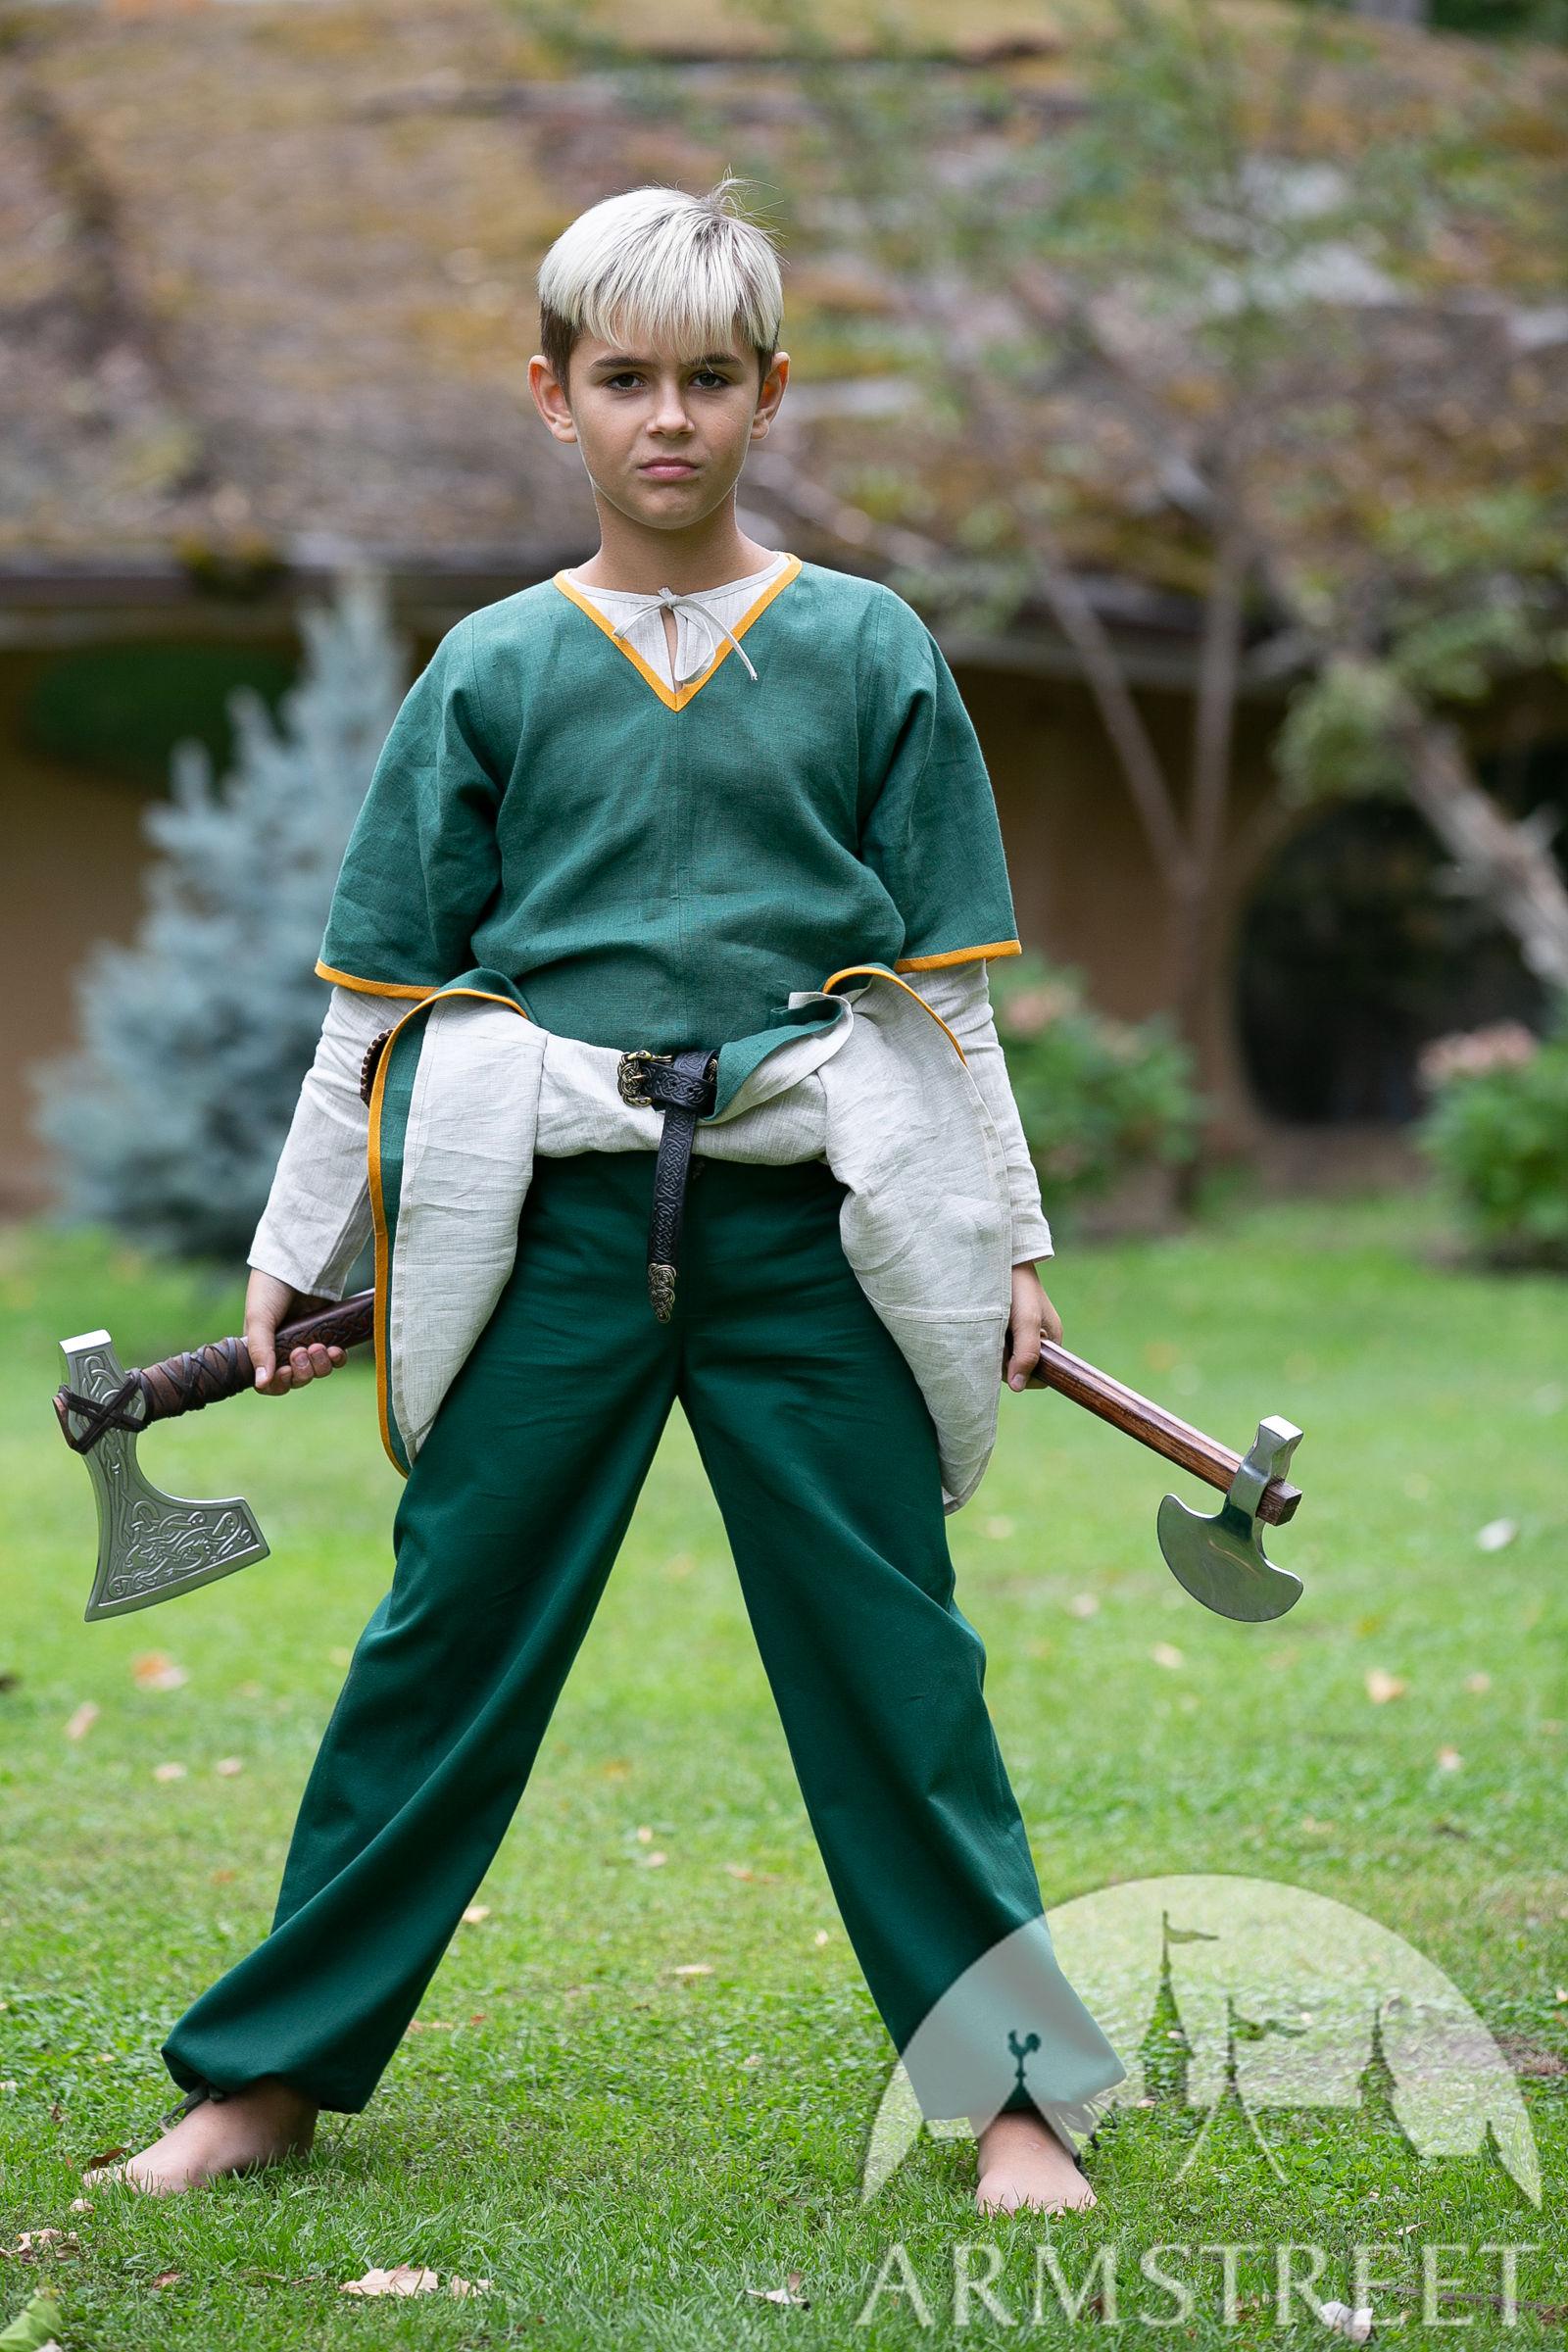 https://armstreet.com/catalogue/full/kids-cotton-medieval-pants-first-adventure-for-children.jpg